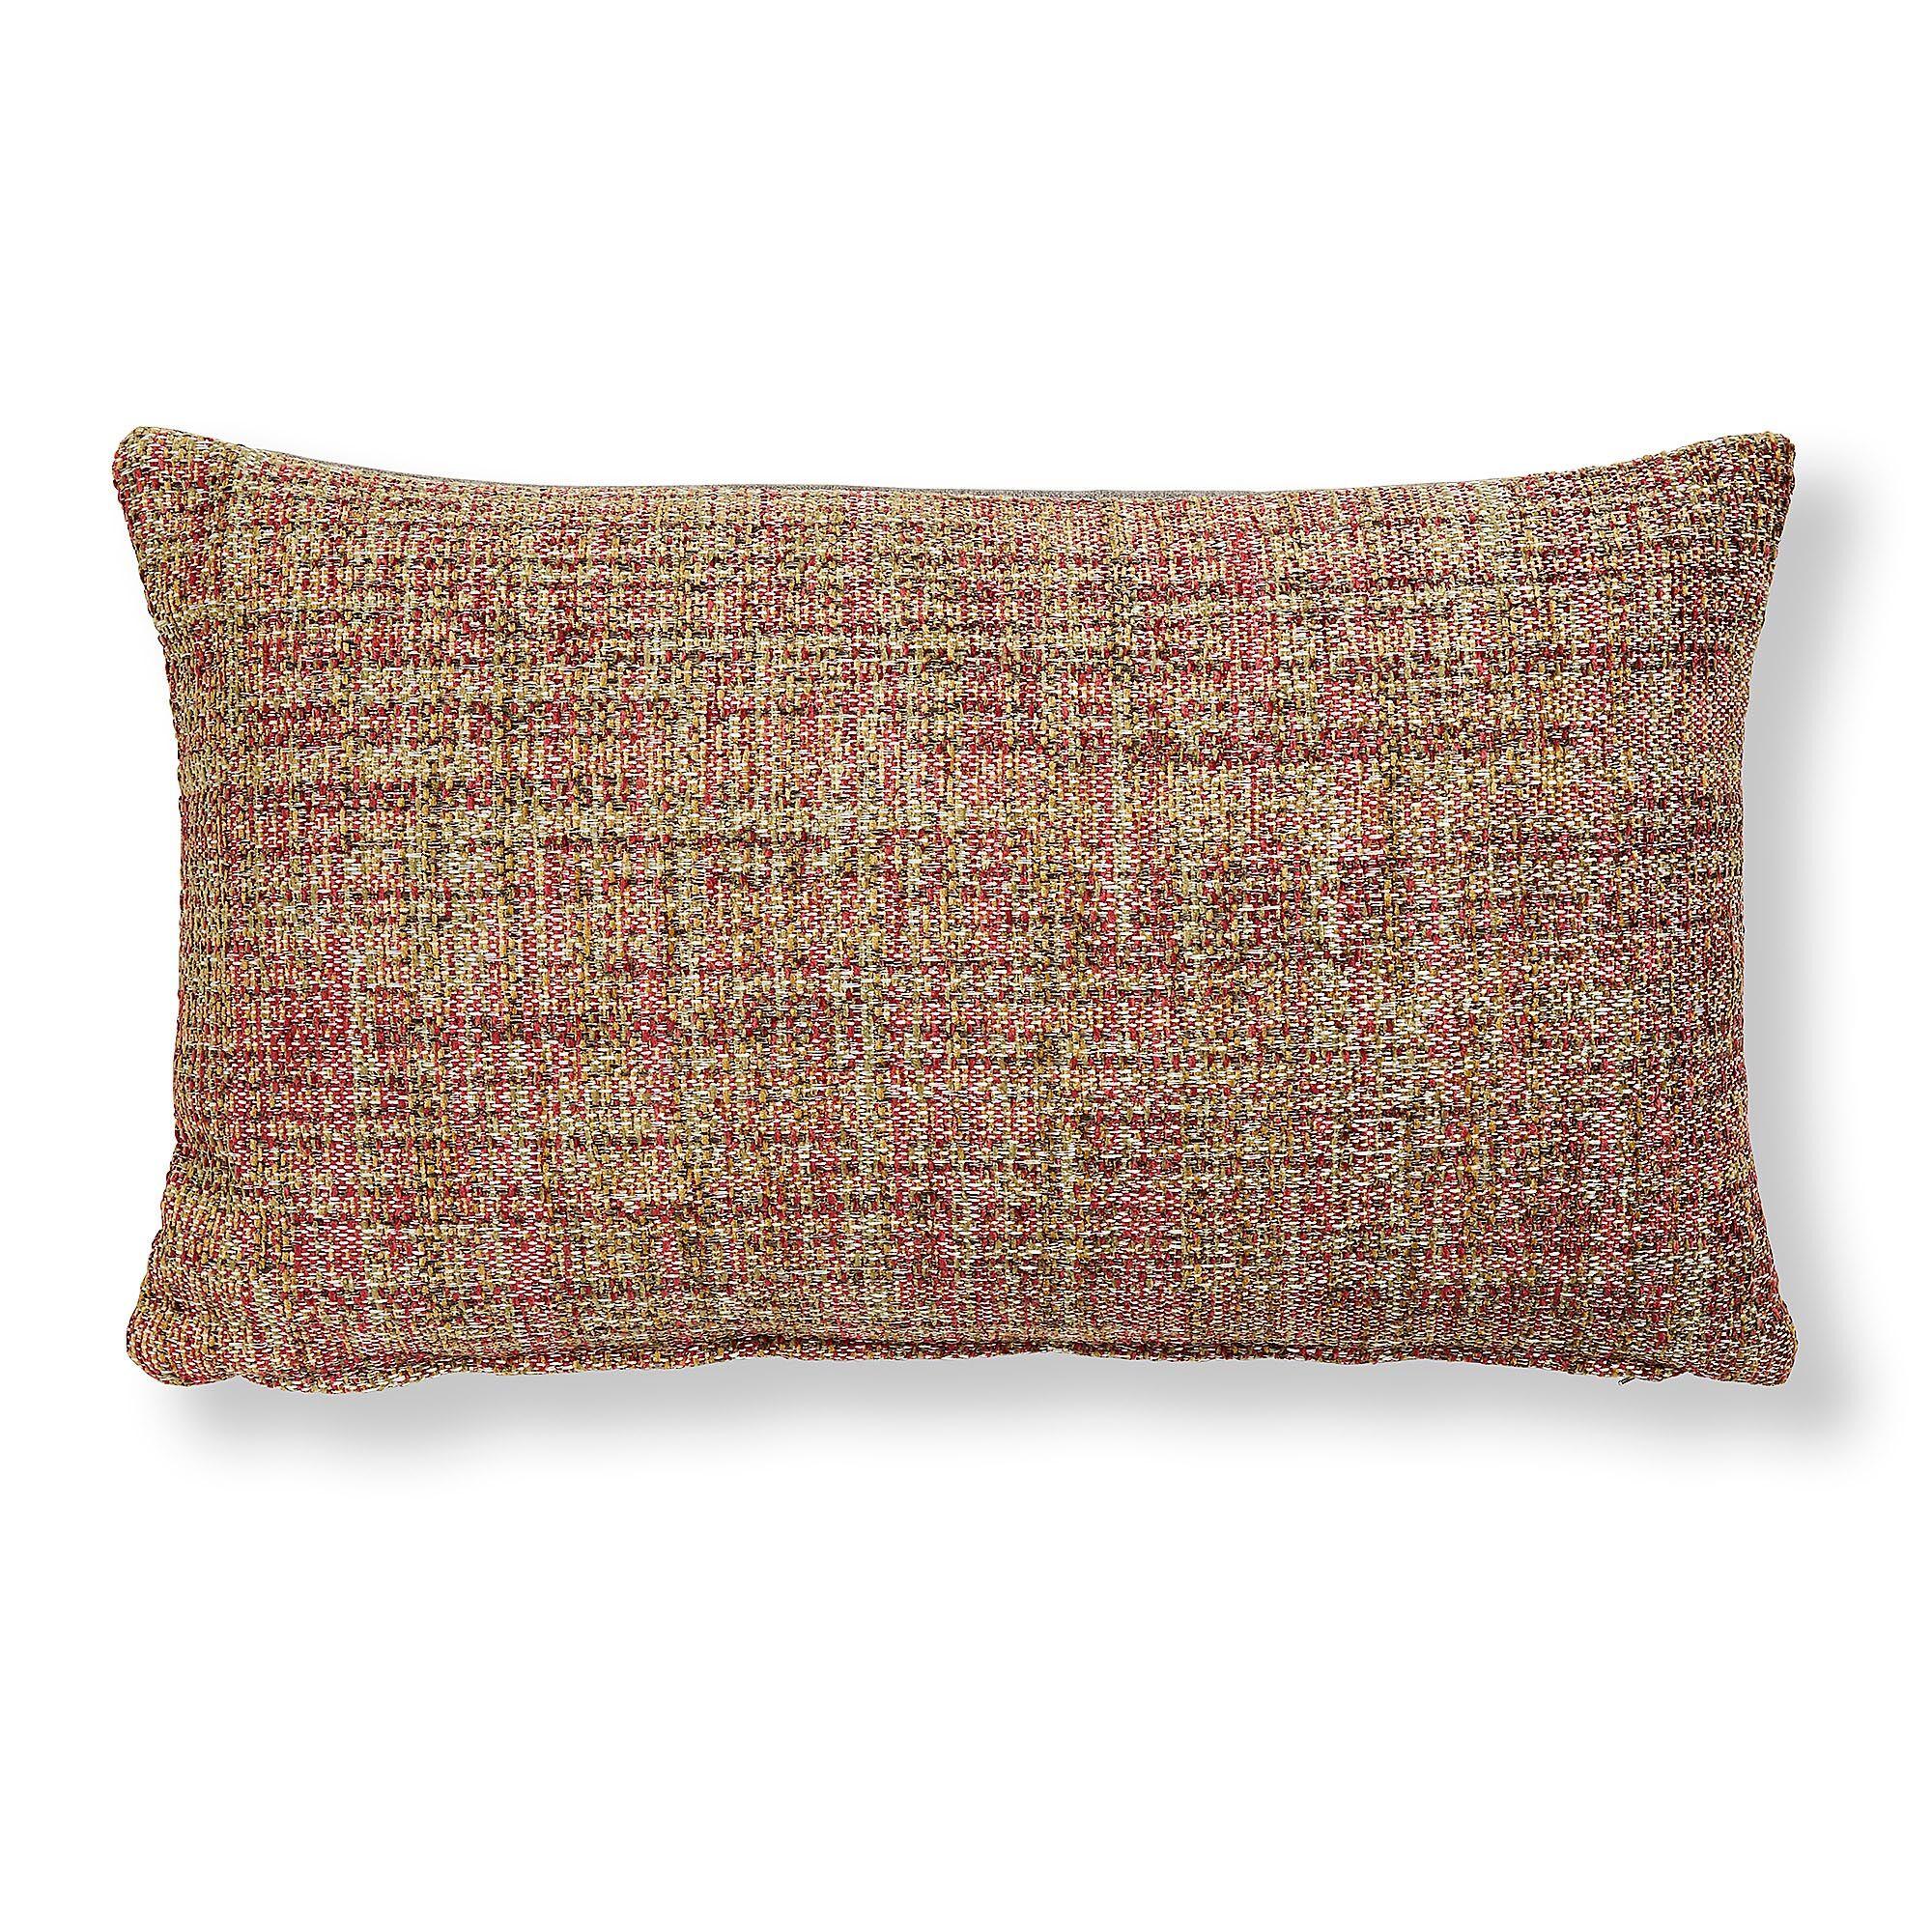 Kave Home Fodera cuscino Boho 30 x 50 cm rosa